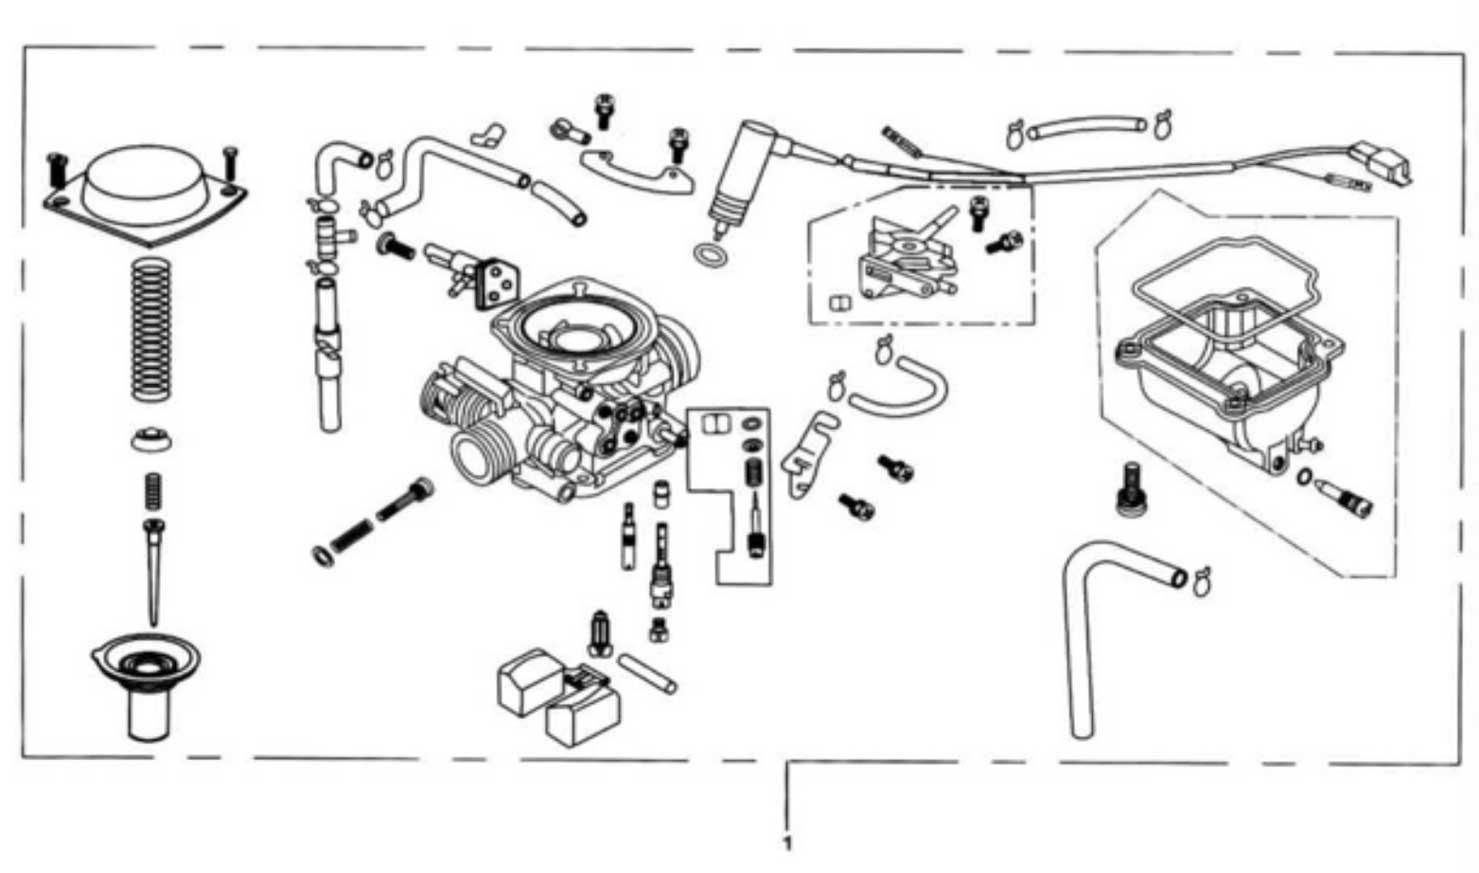 Cf Moto 250 Wiring Diagram Trusted 600 Diagrams 2008 Parts Auto